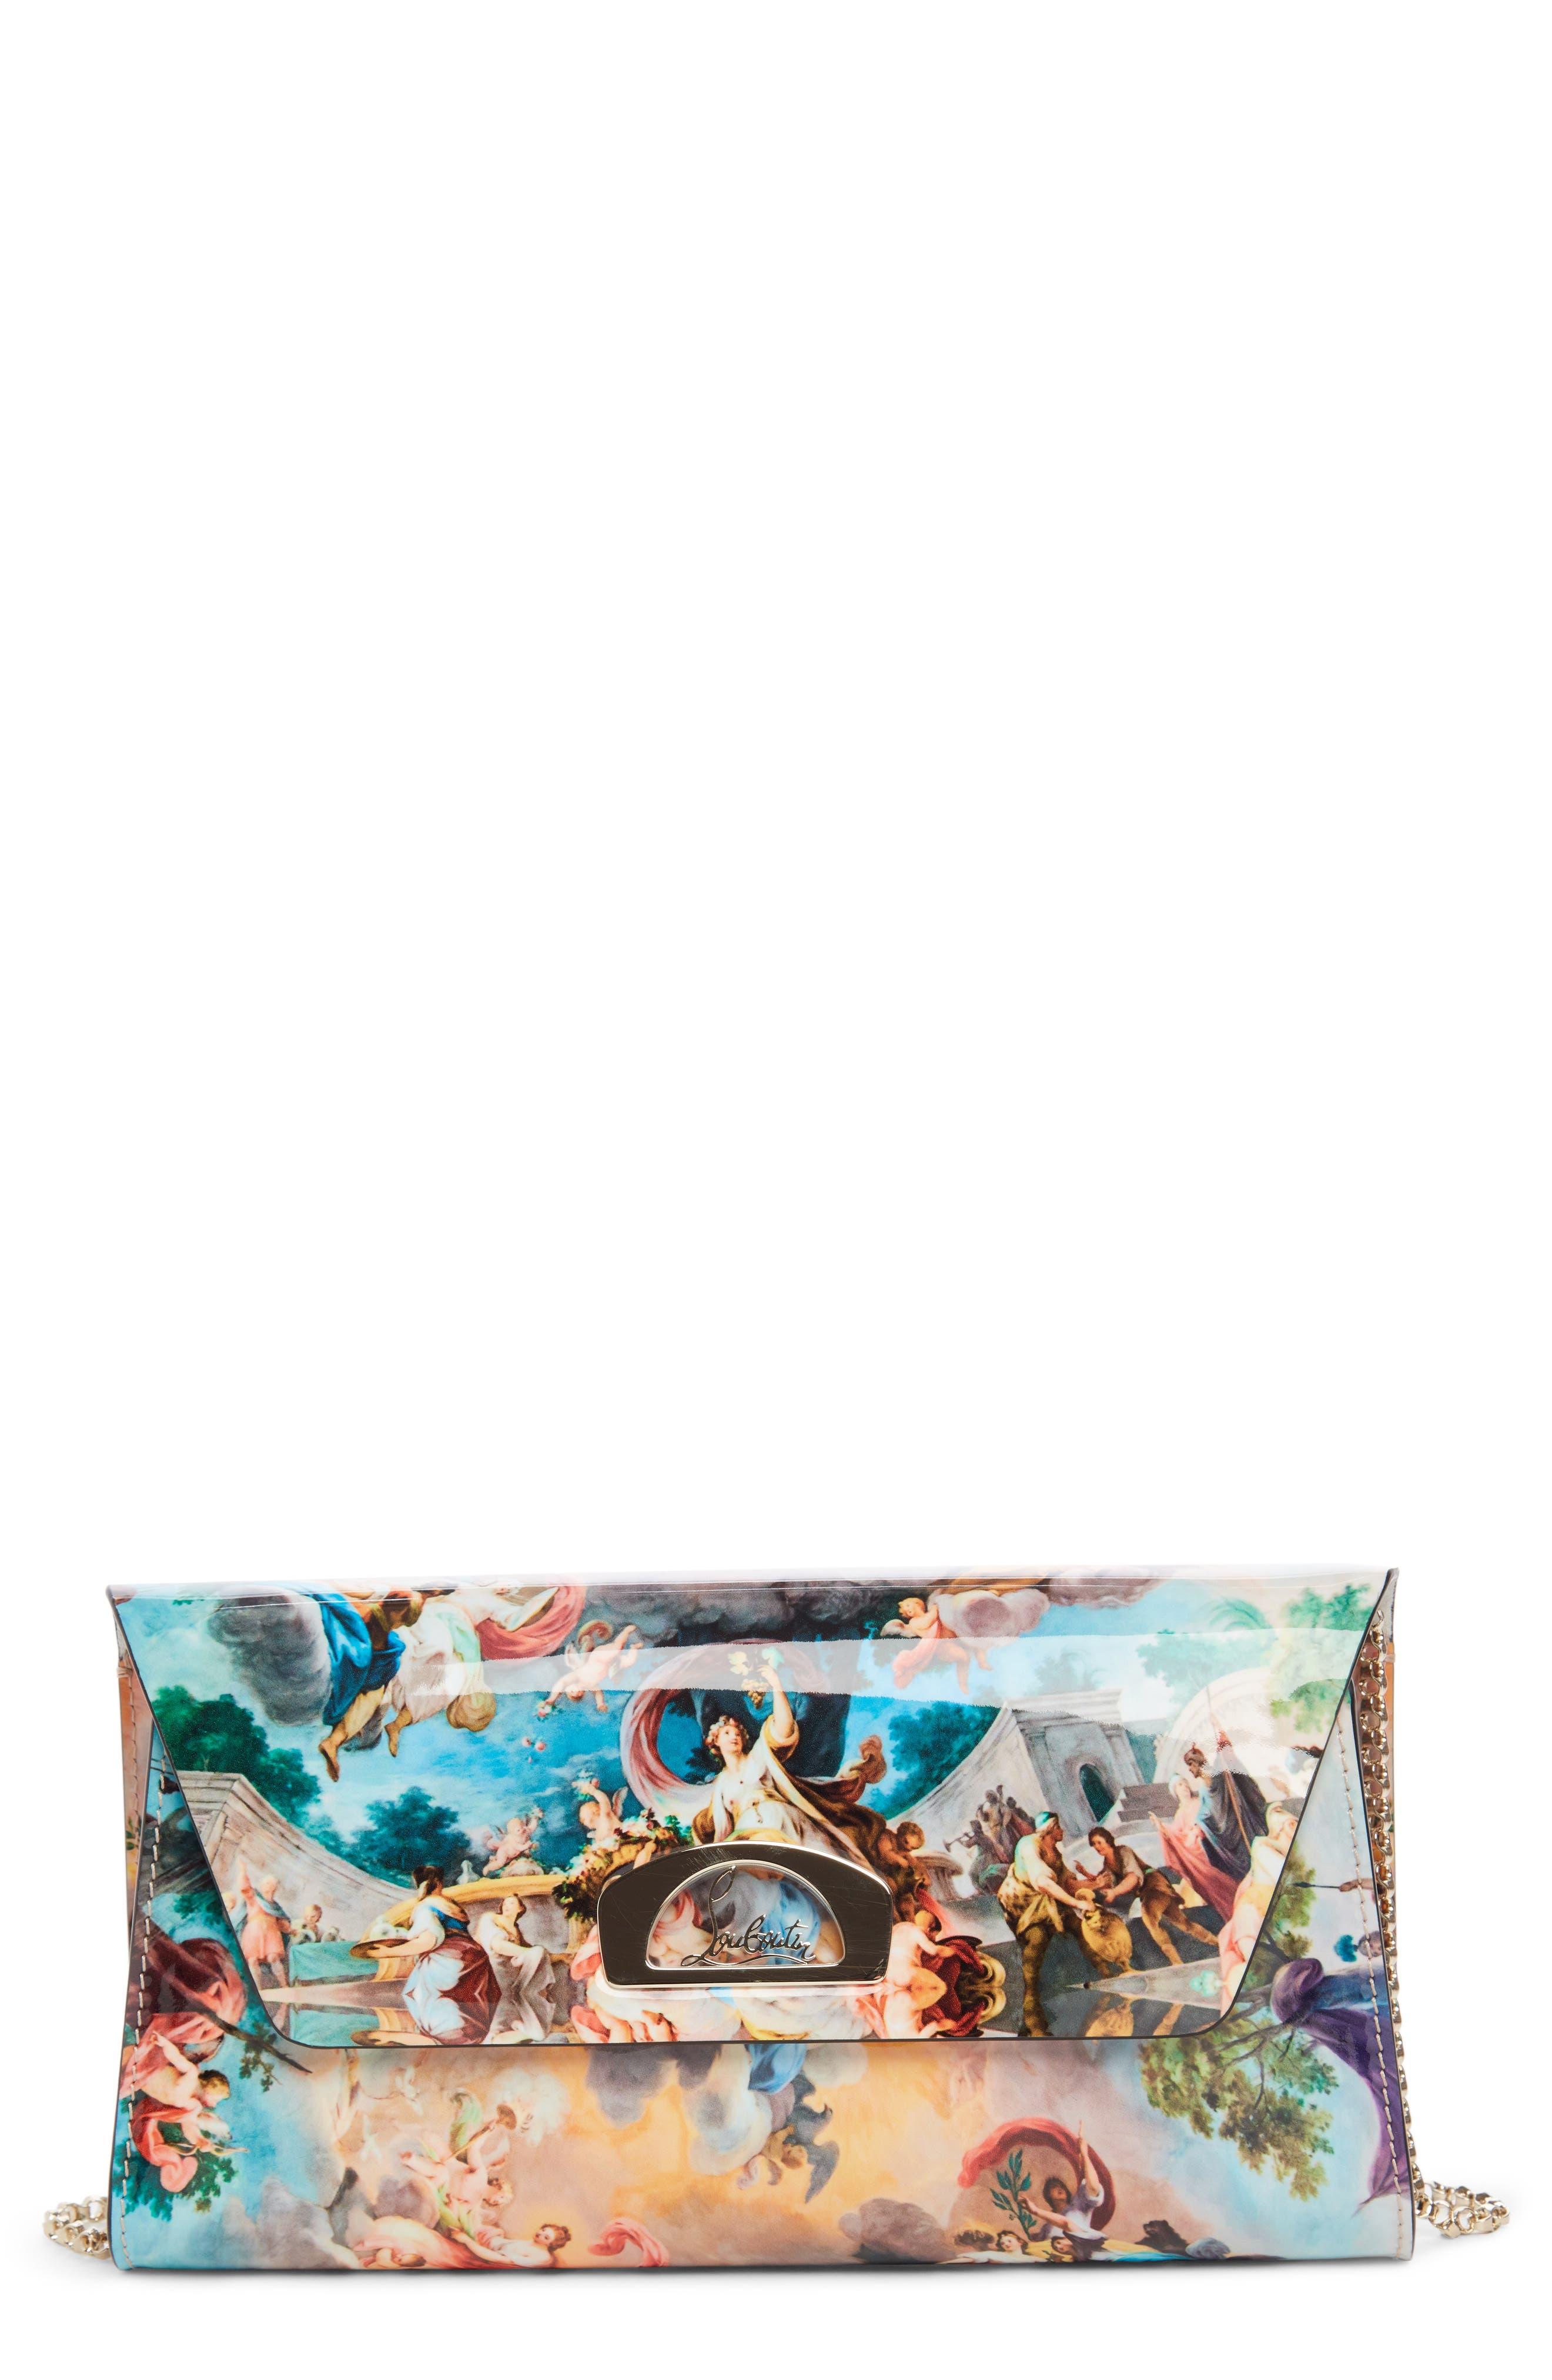 Vero Dodat Fresco Print Leather Clutch,                         Main,                         color, 400